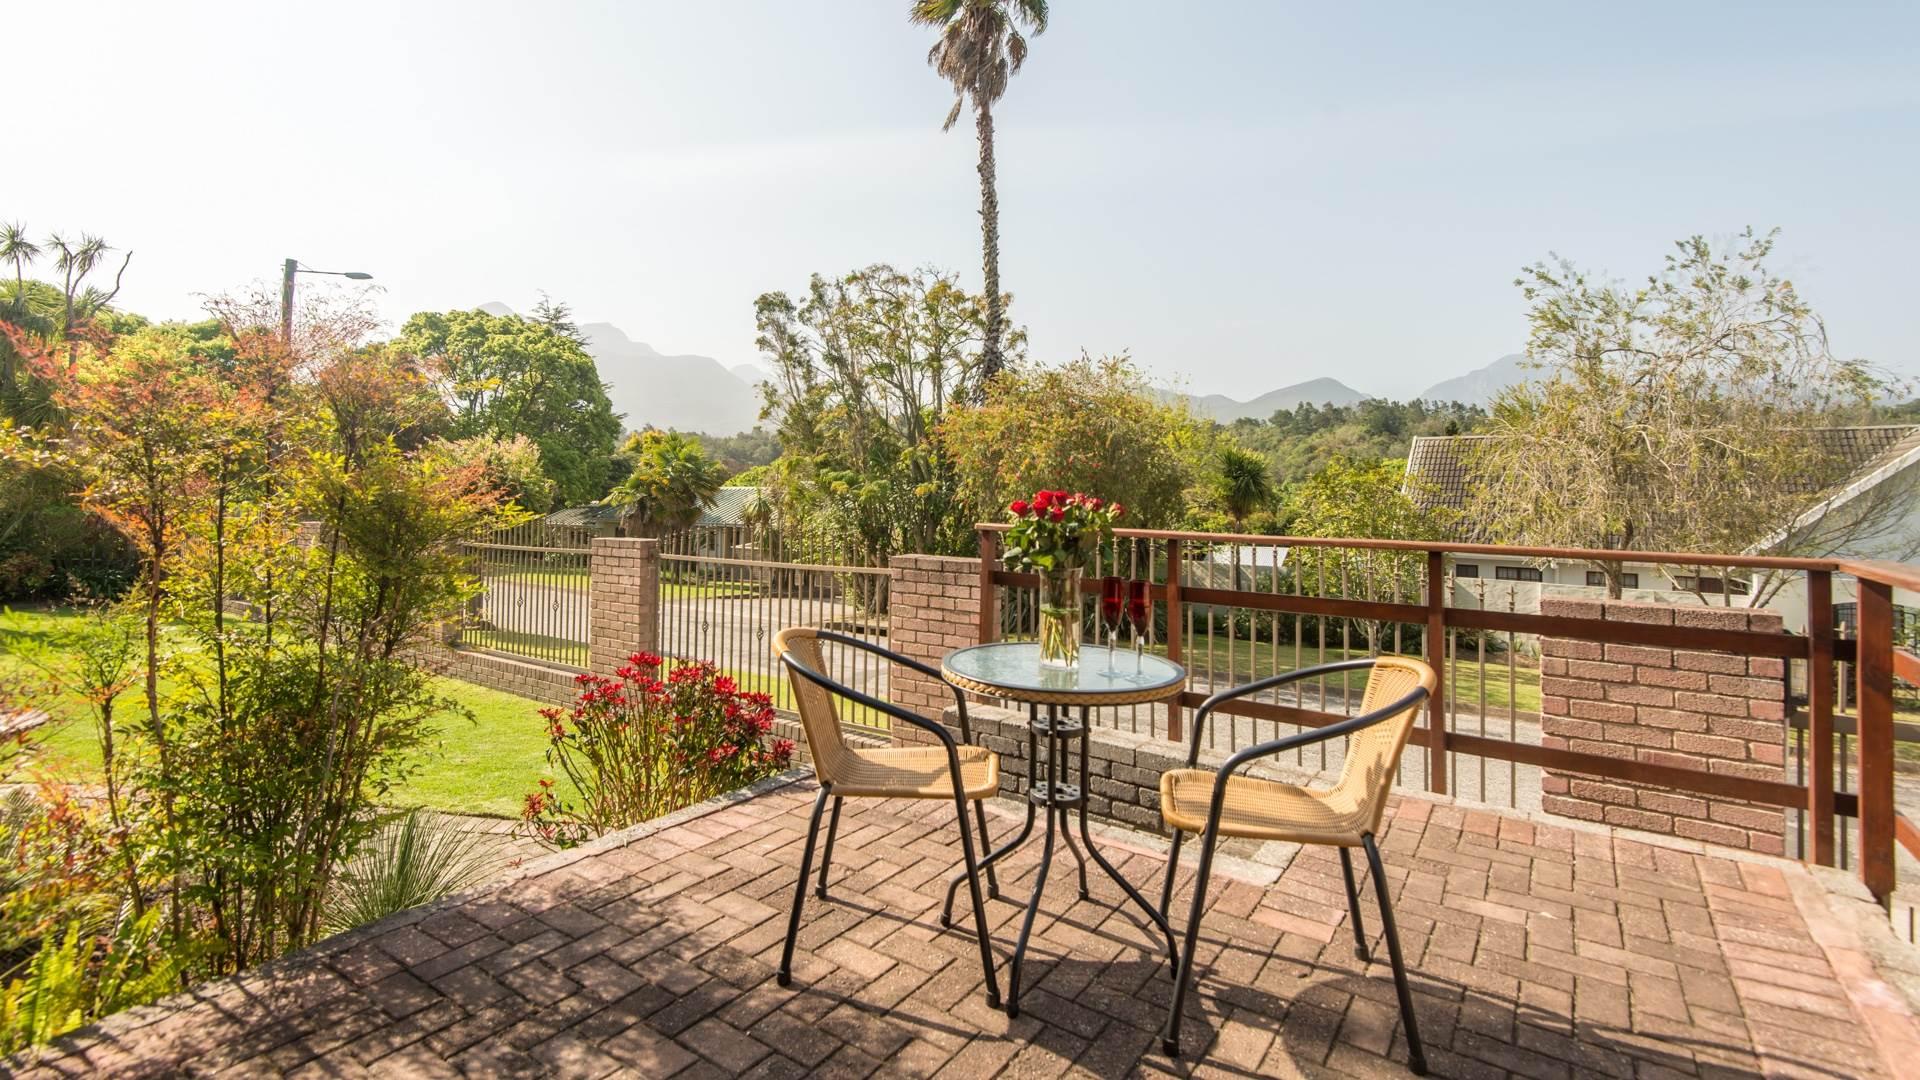 5 BedroomHouse For Sale In Eden